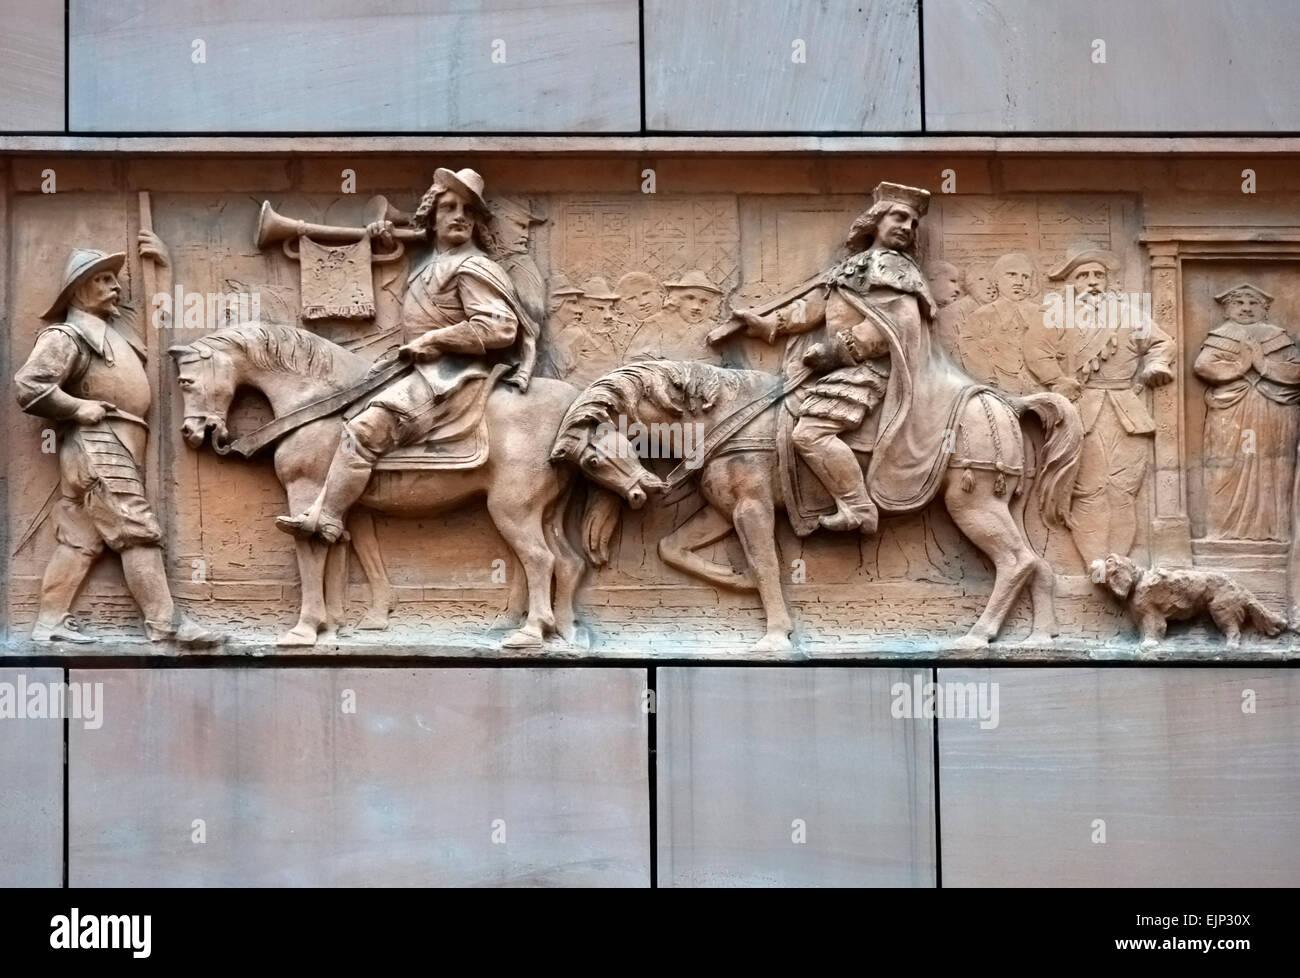 relief-sculpture-1-poultry-london-england-united-kingdom-europe-EJP30X.jpg